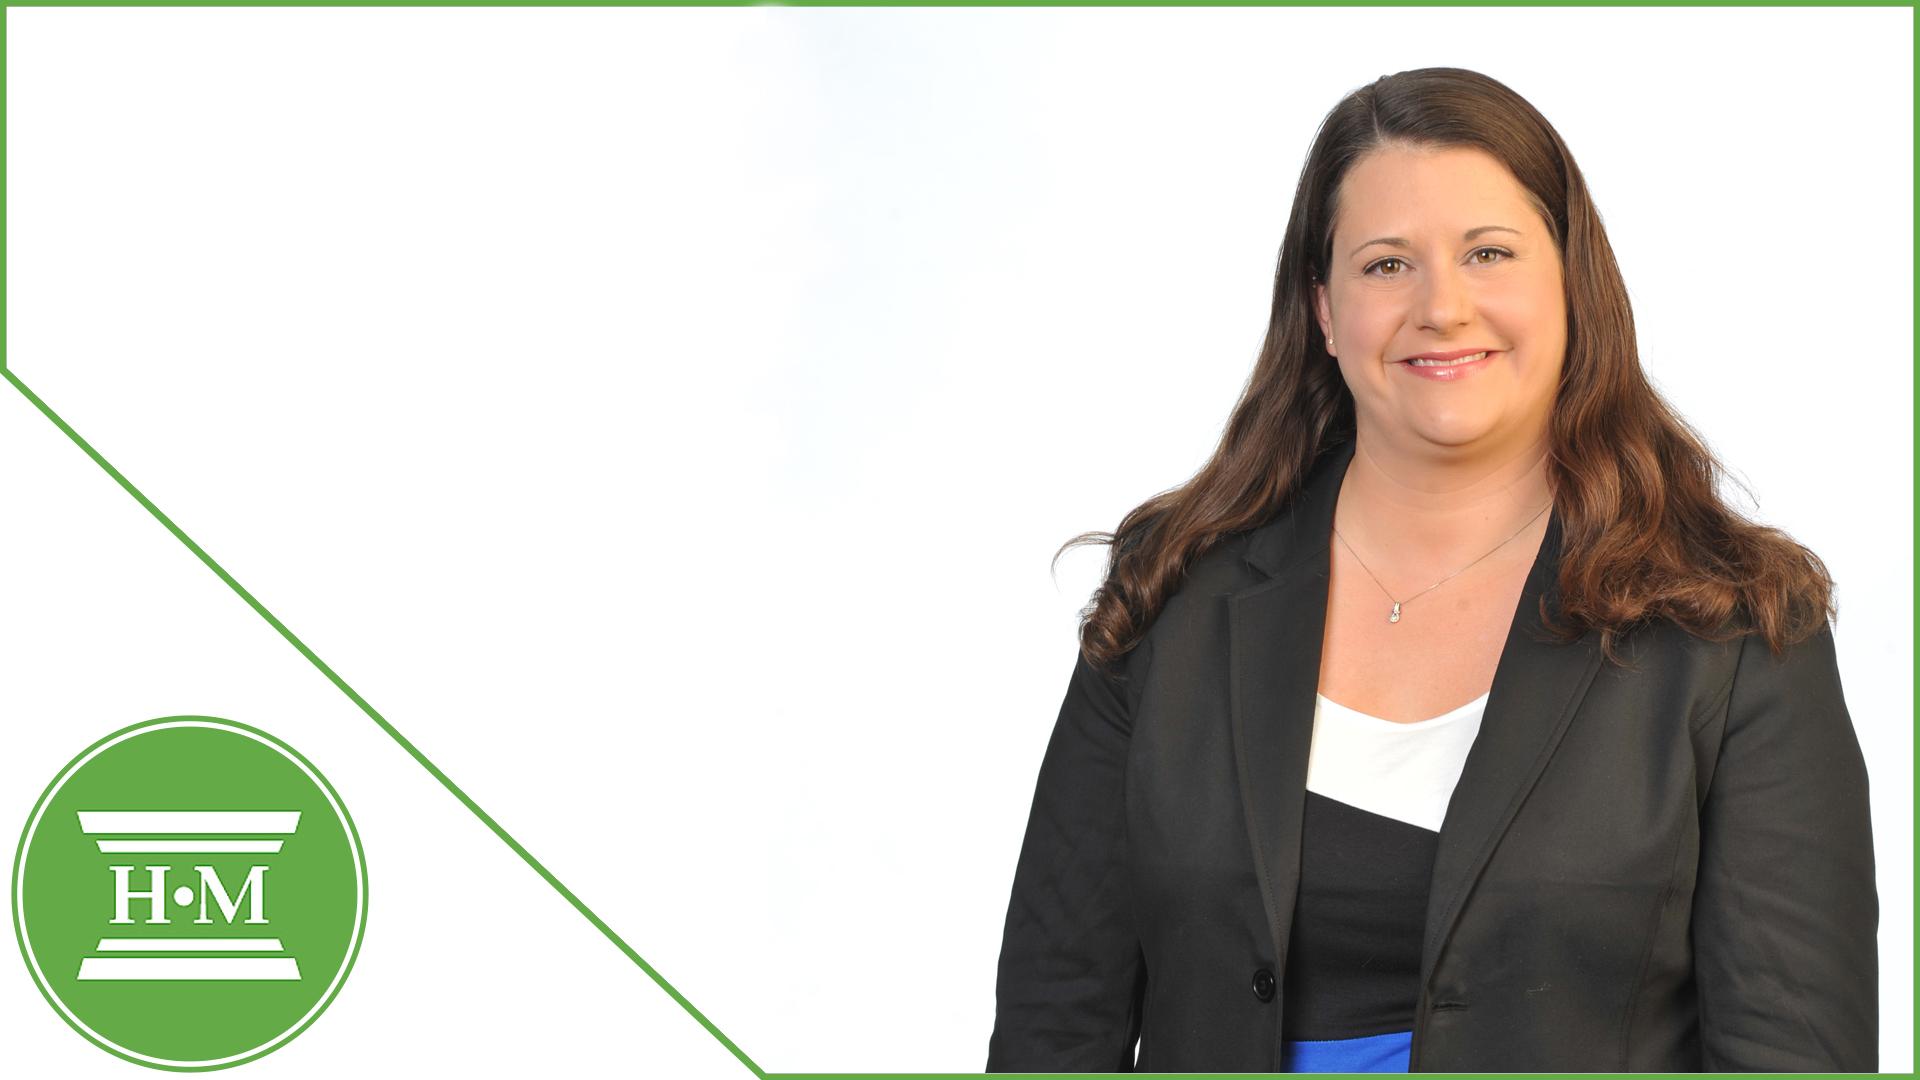 Julie Wildman BBA, MBA, CPA, CIRP